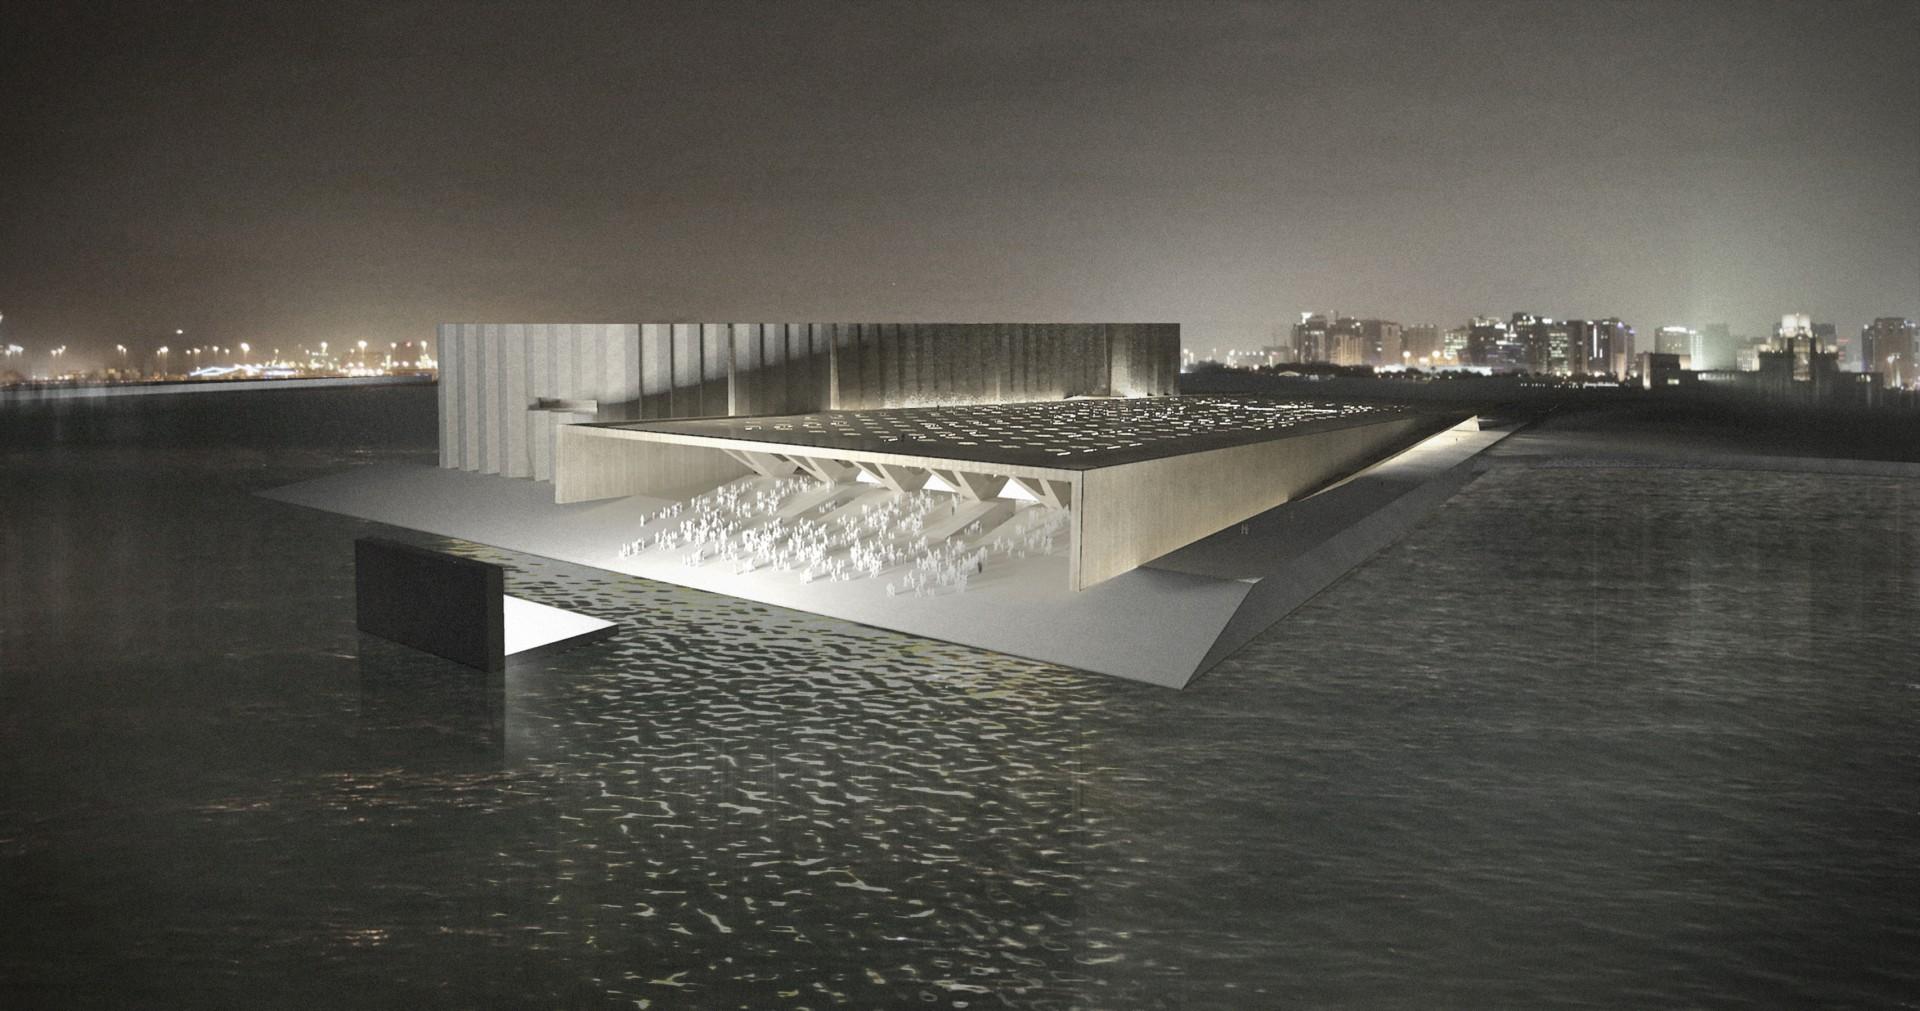 Alejandro Aravena and Elemental win the Art Mill International Design Competition